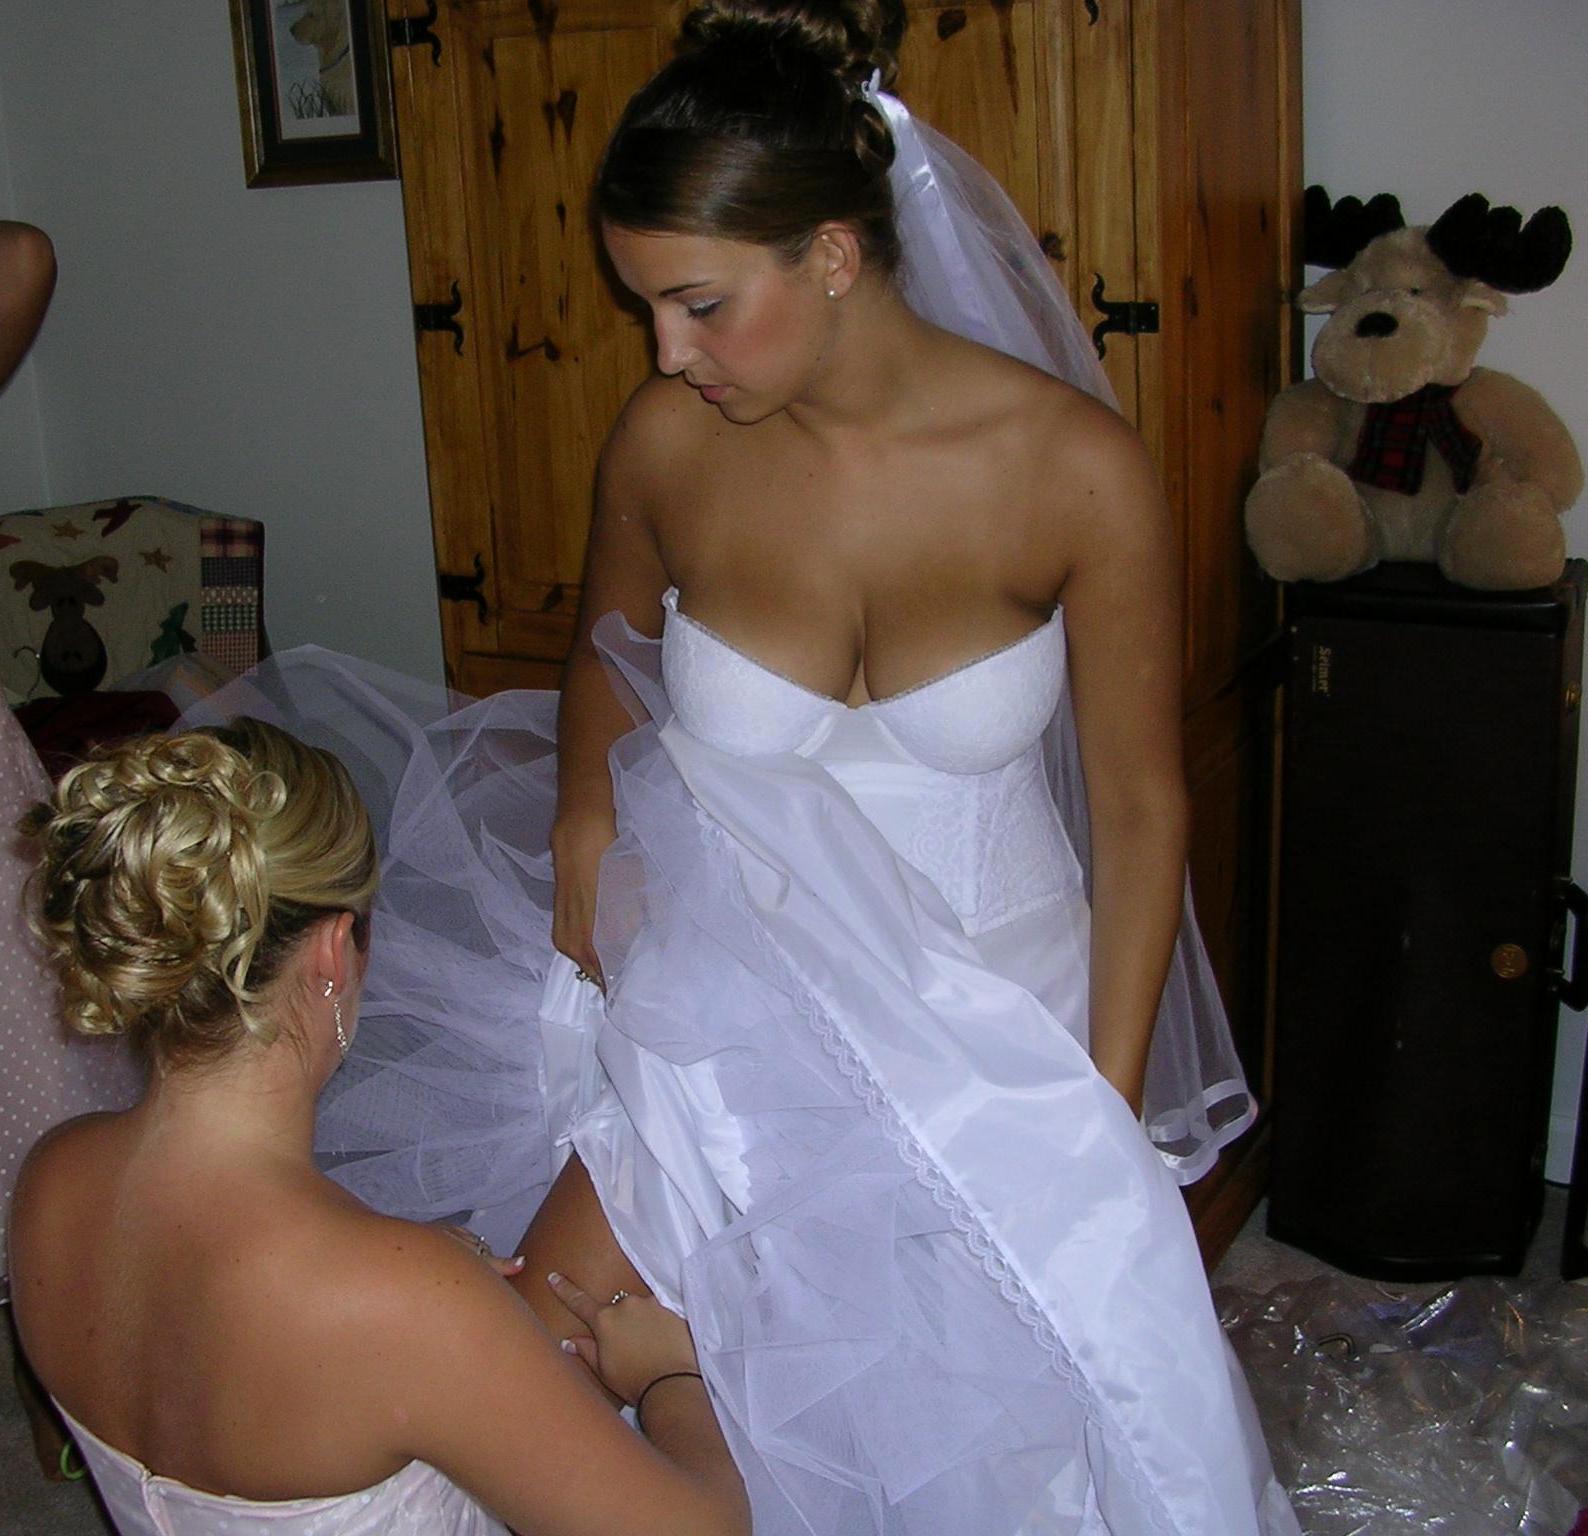 Измена на свадьбе - Измена, порно рассказы, порно рассказы ...